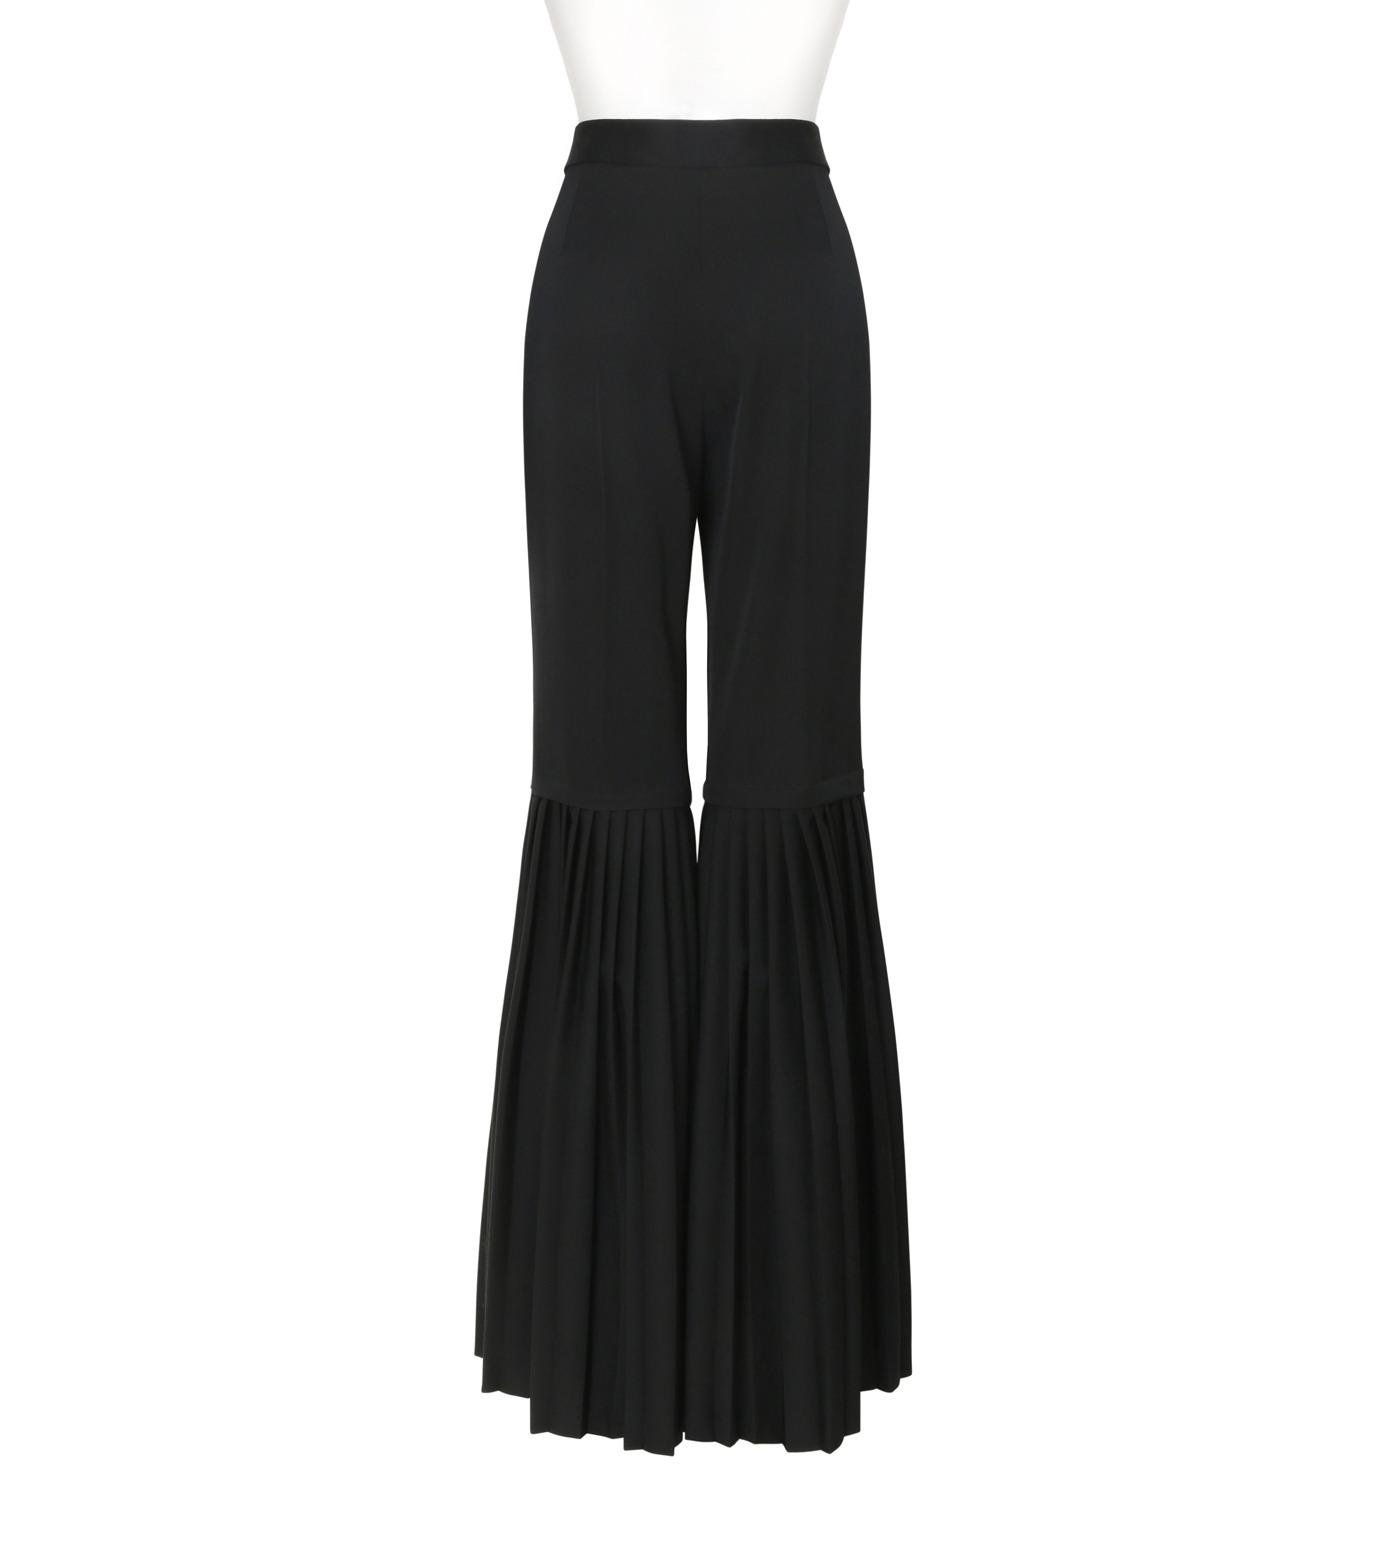 Stella McCartney(ステラマッカートニー)のChellini Pleated Pants-BLACK(パンツ/pants)-444881-SHB55-13 拡大詳細画像2